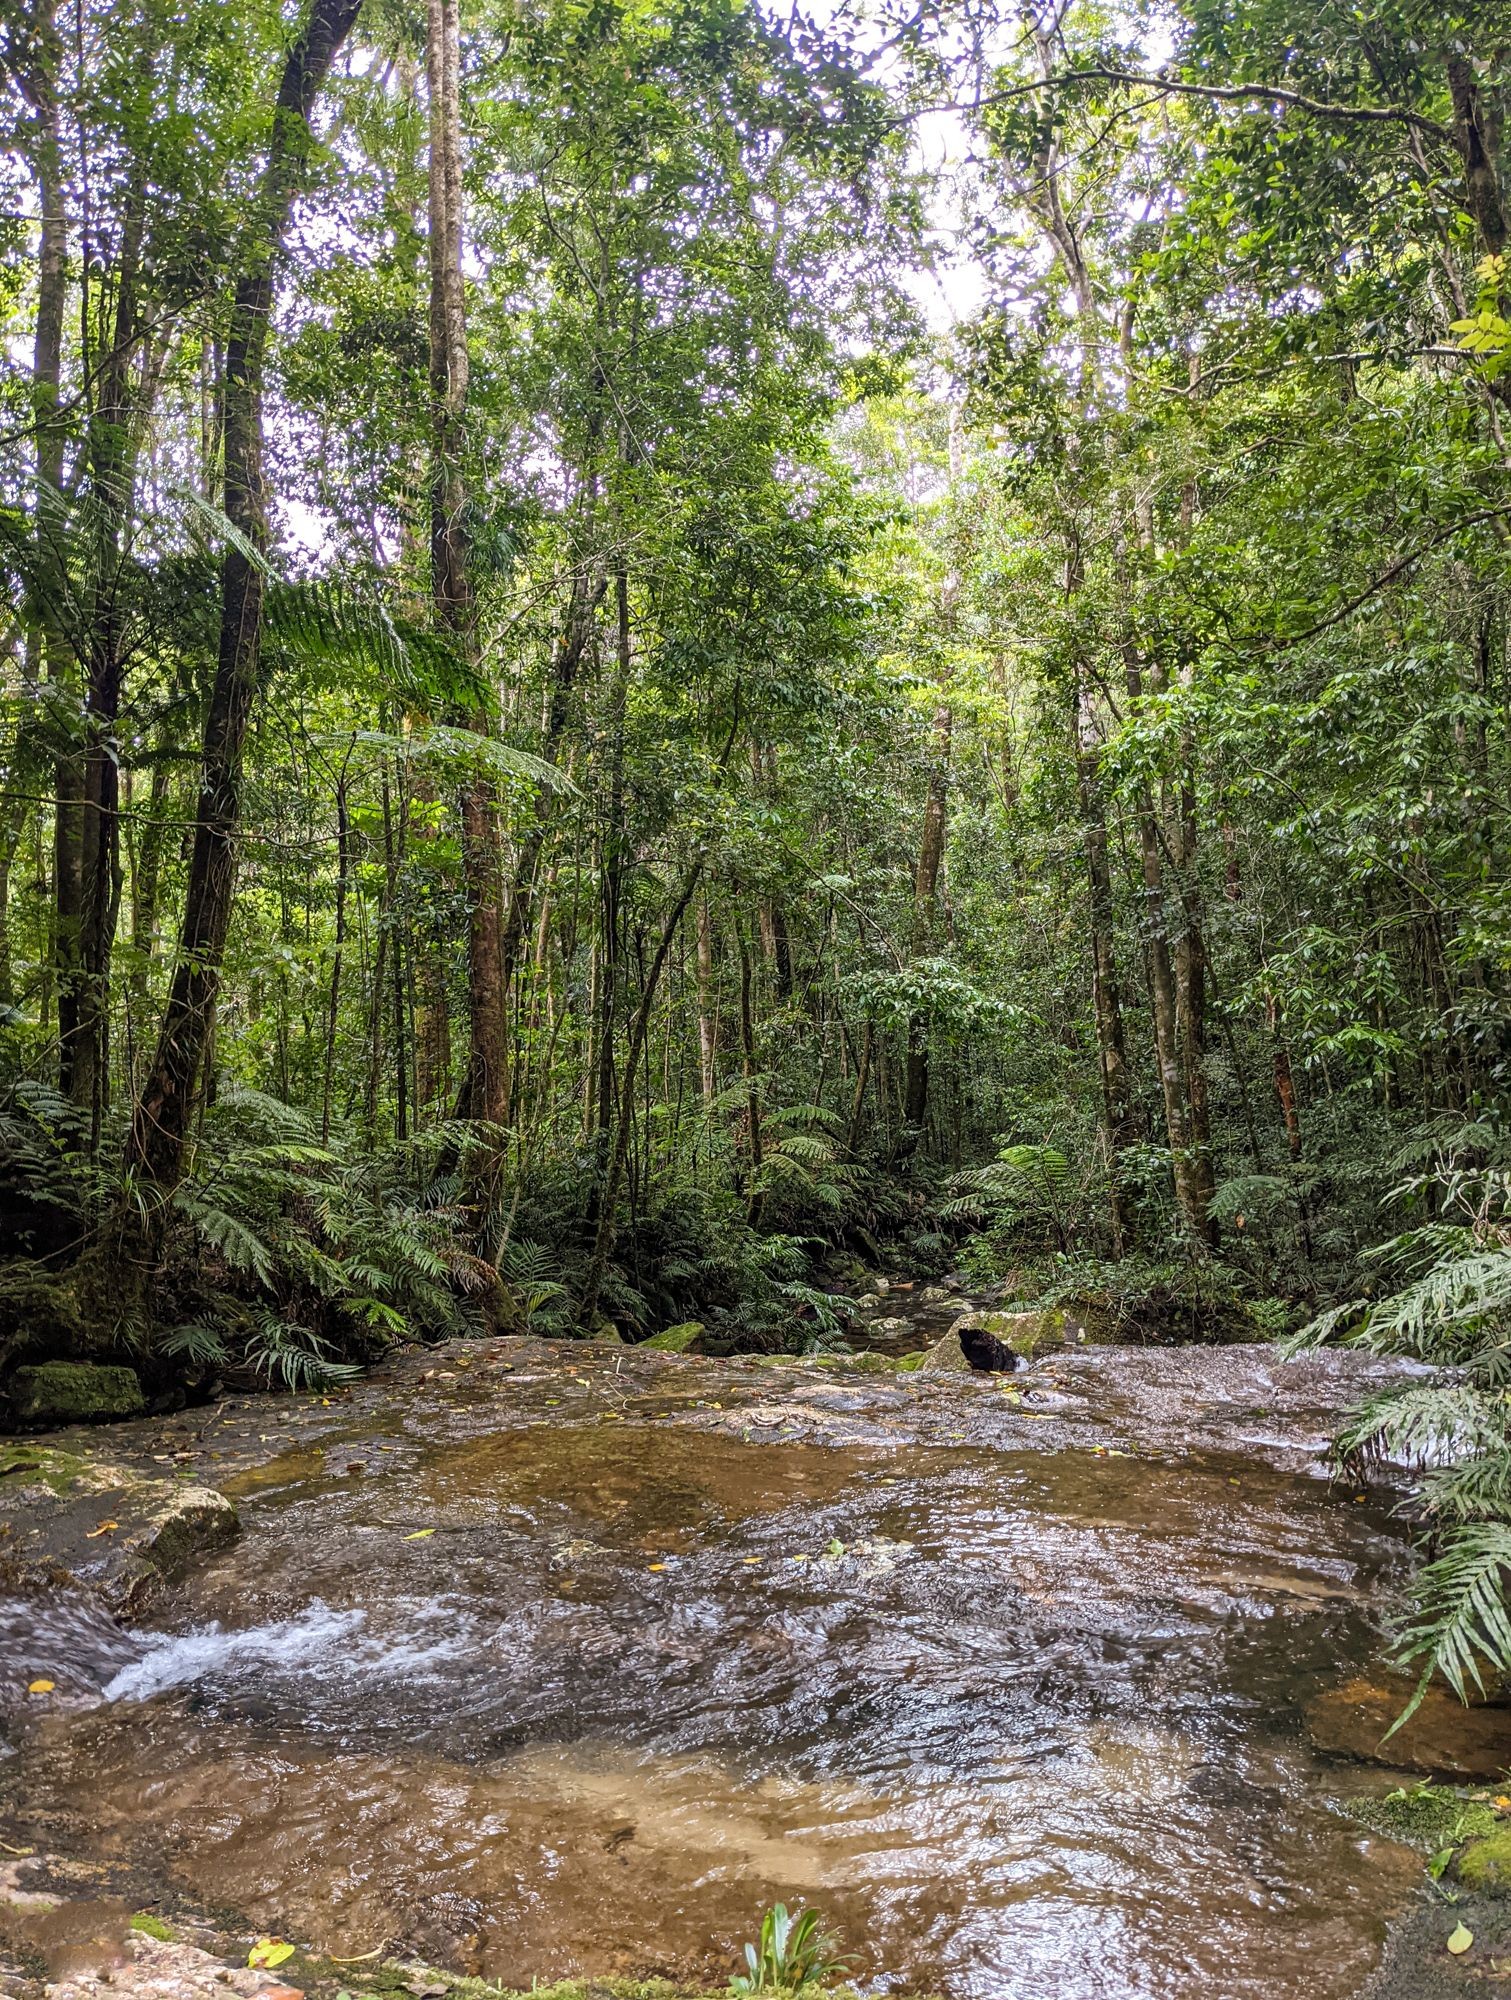 dobly creek scenery